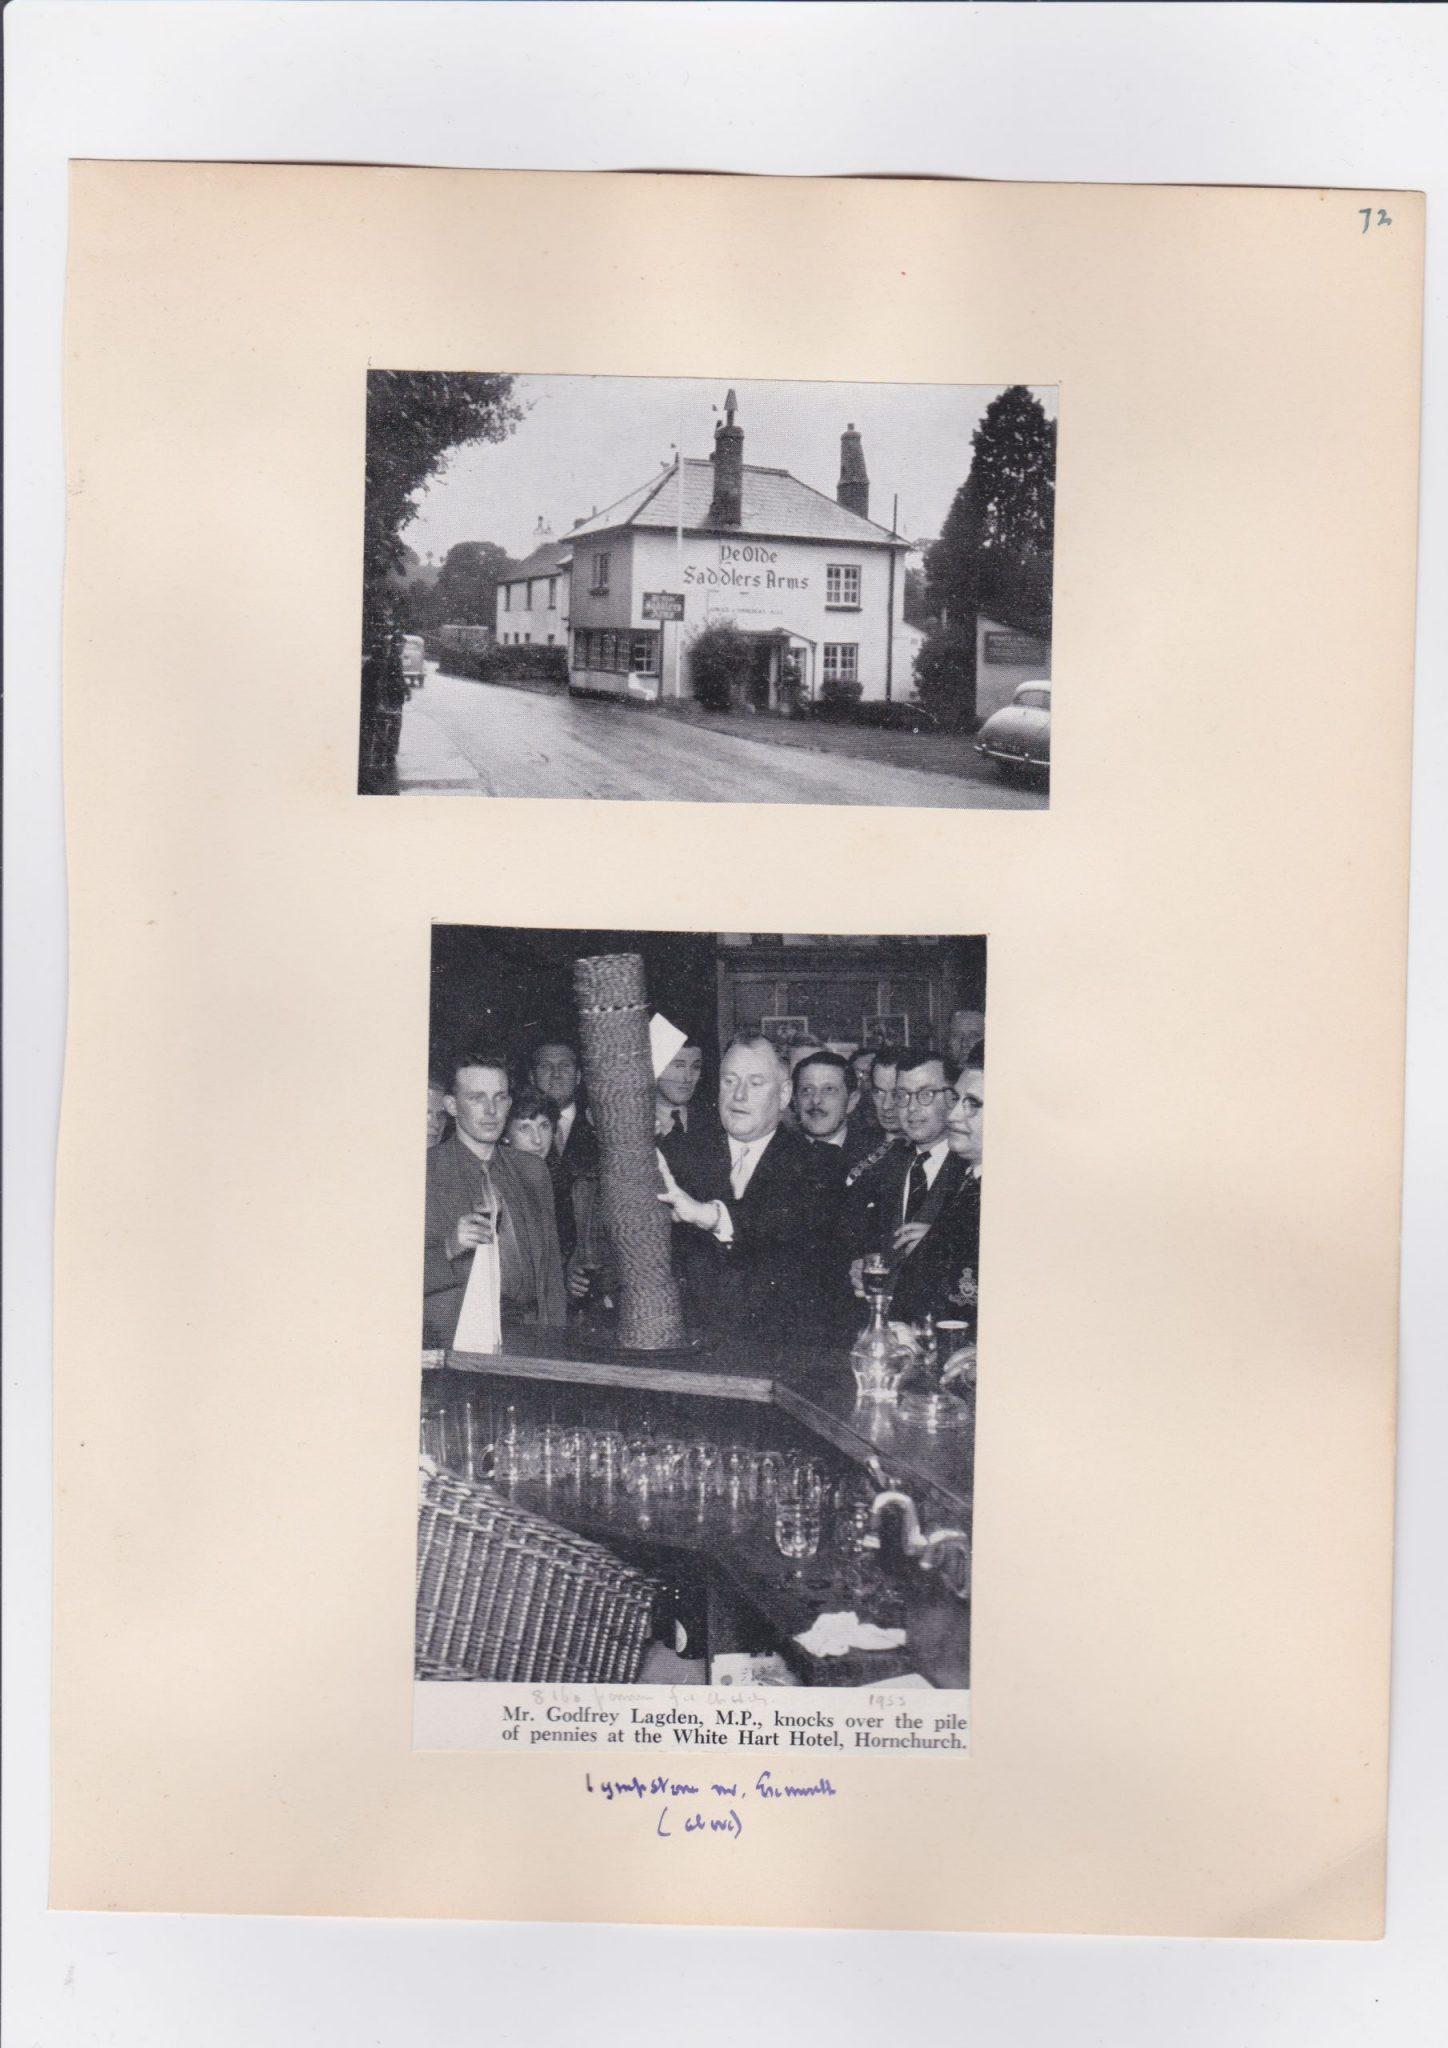 A Pub History Scrapbook Archive 26